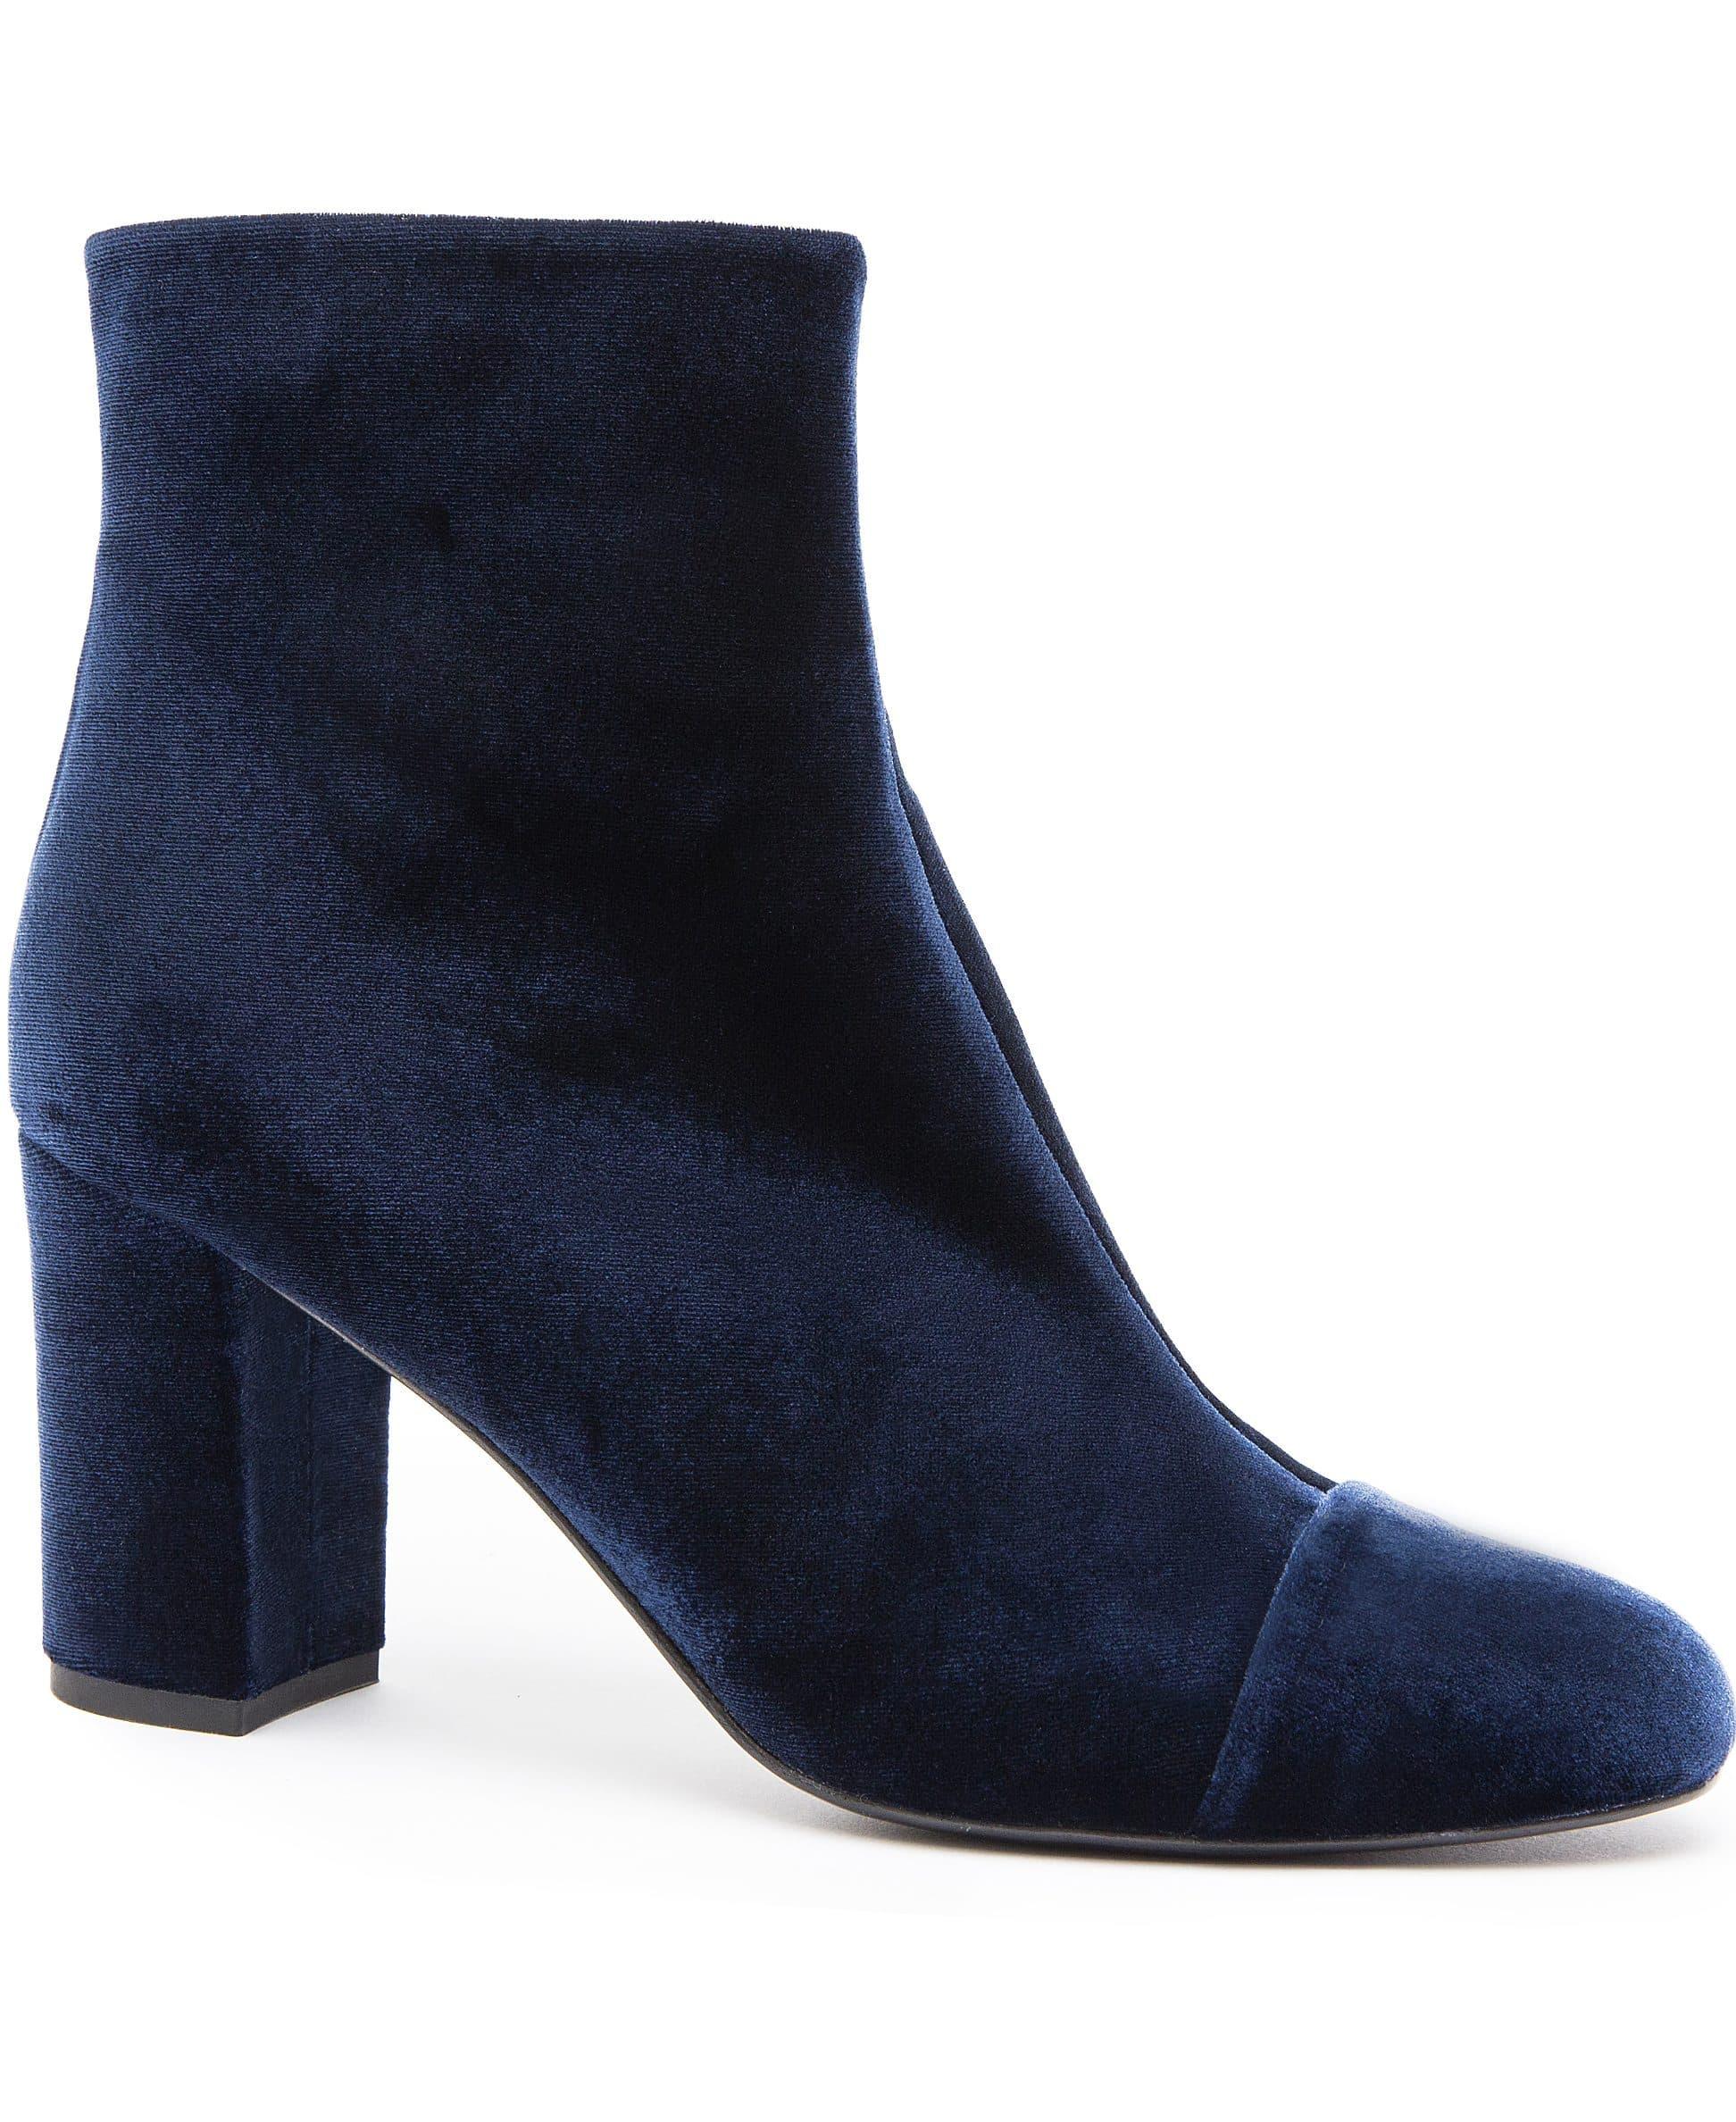 Nightingale Morobé campaign shoe